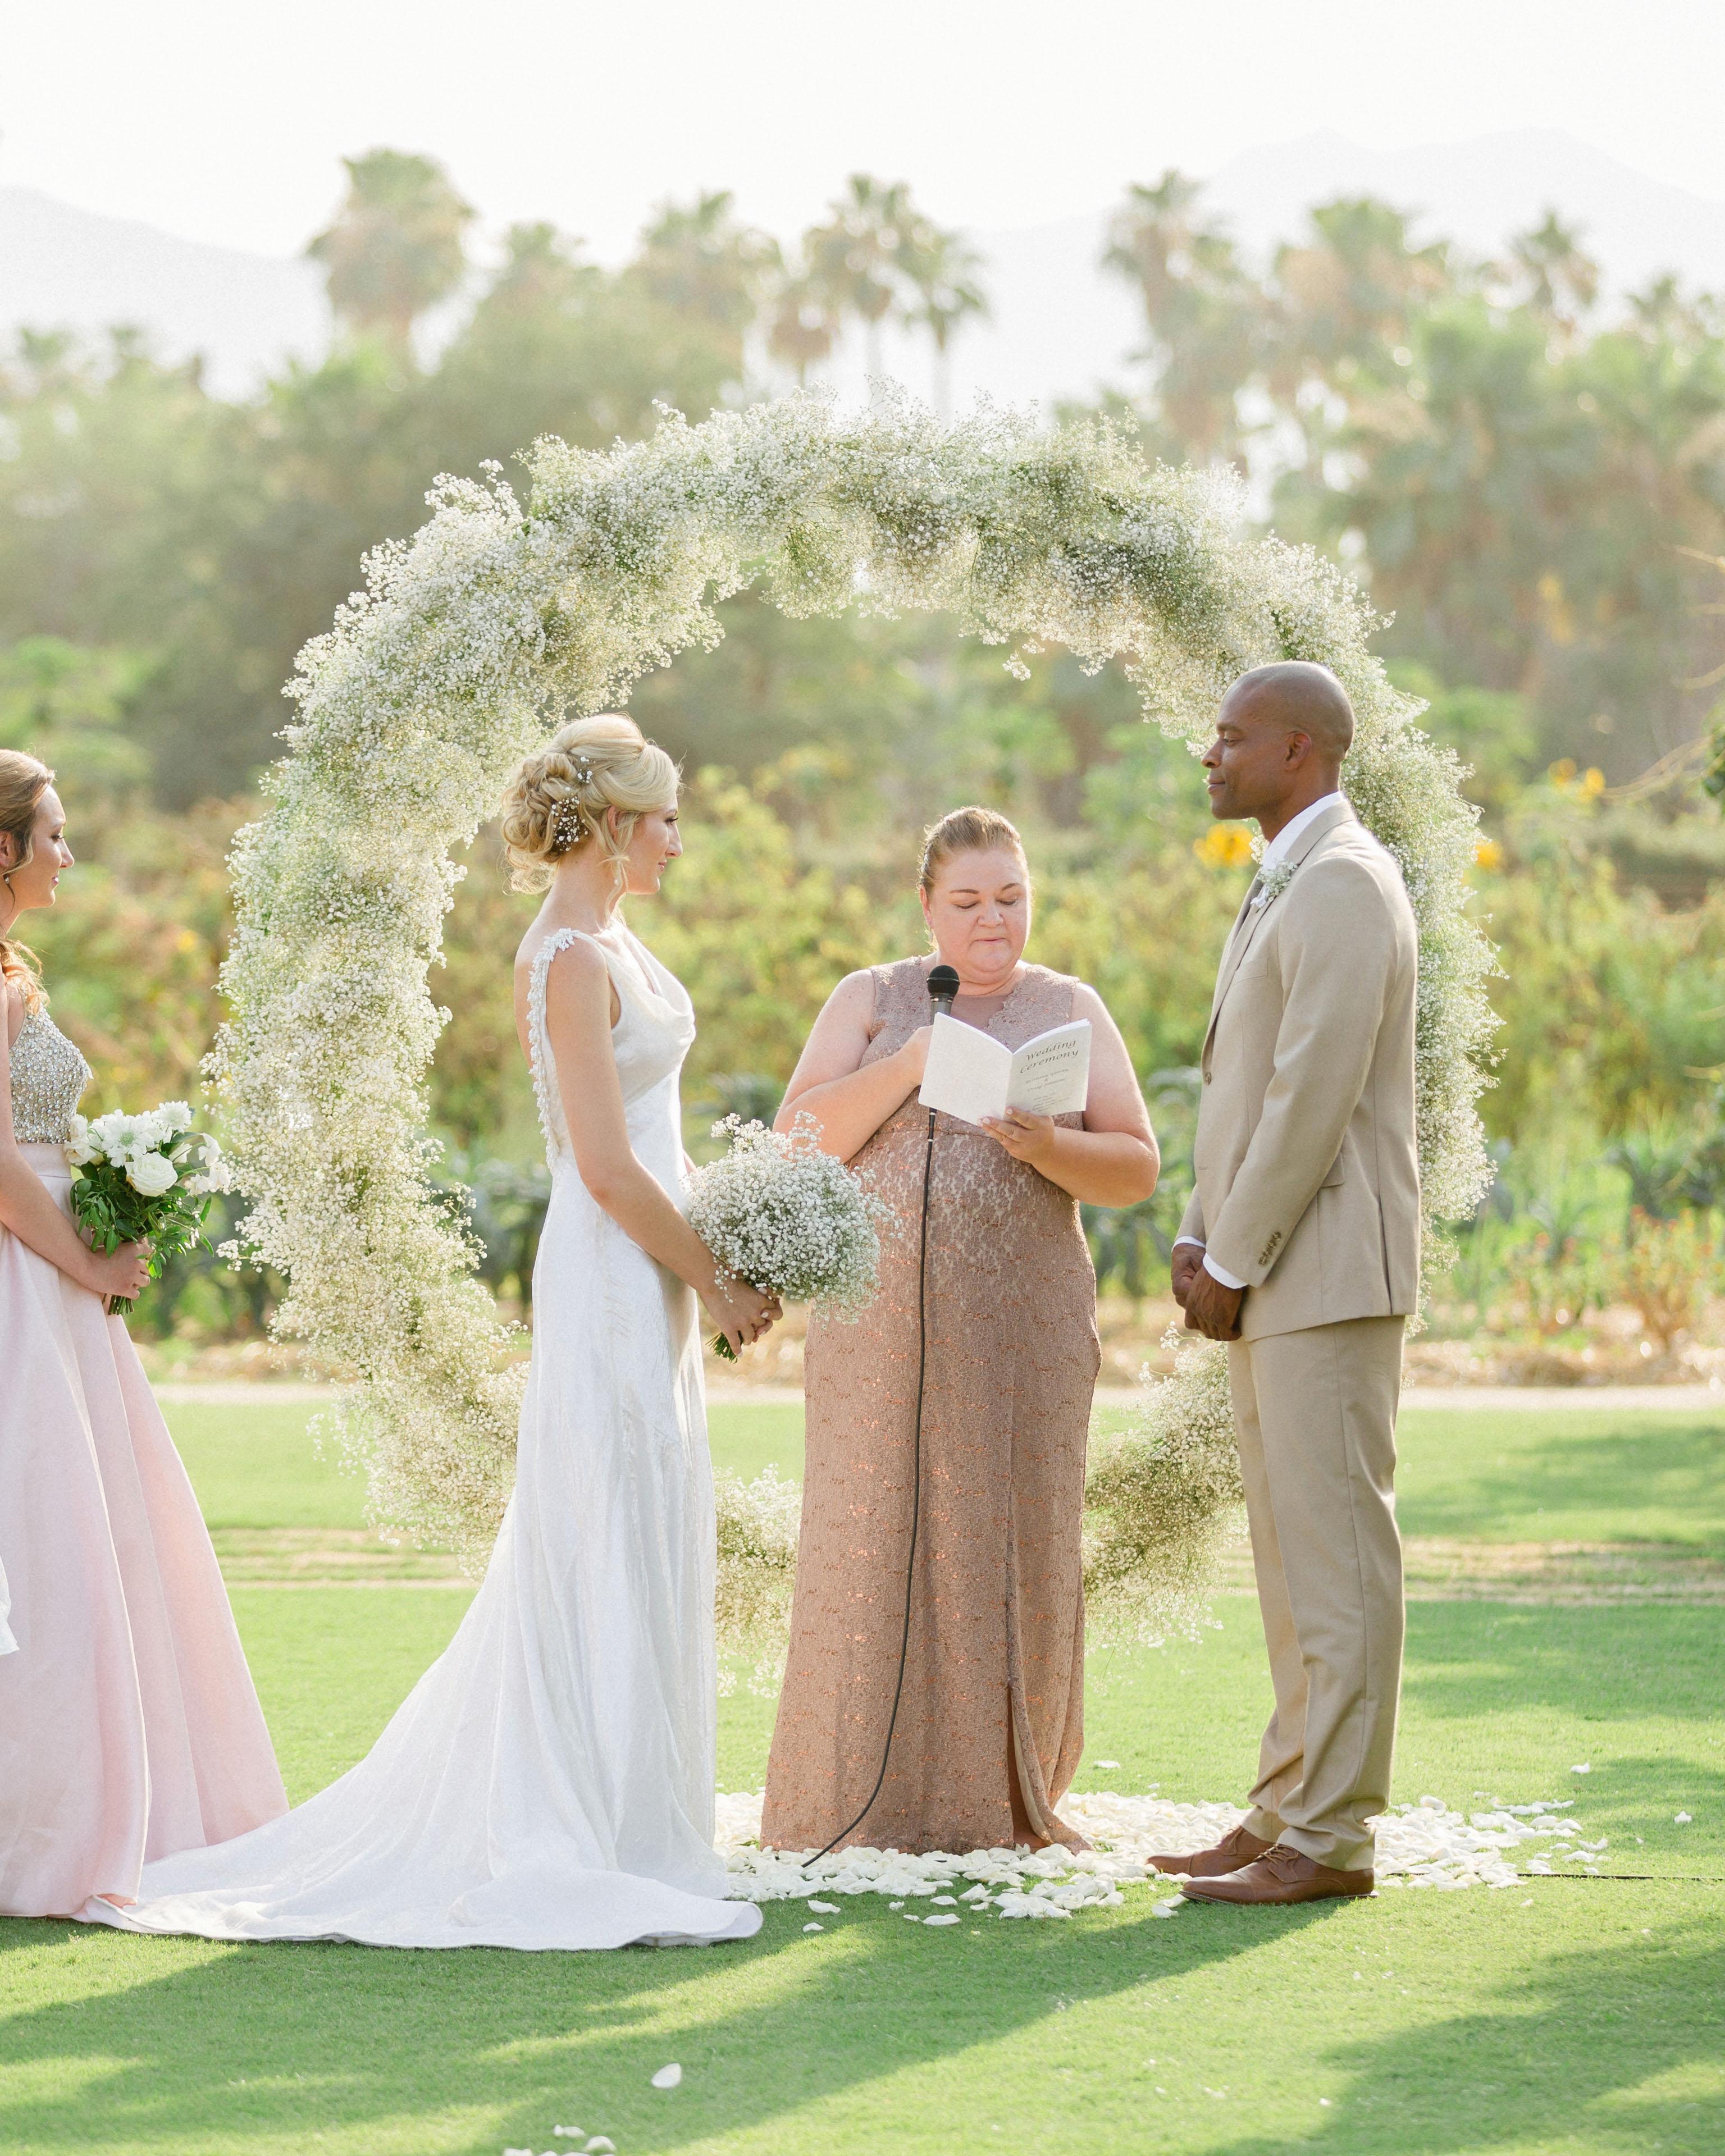 brittany craig wedding ceremony at altar